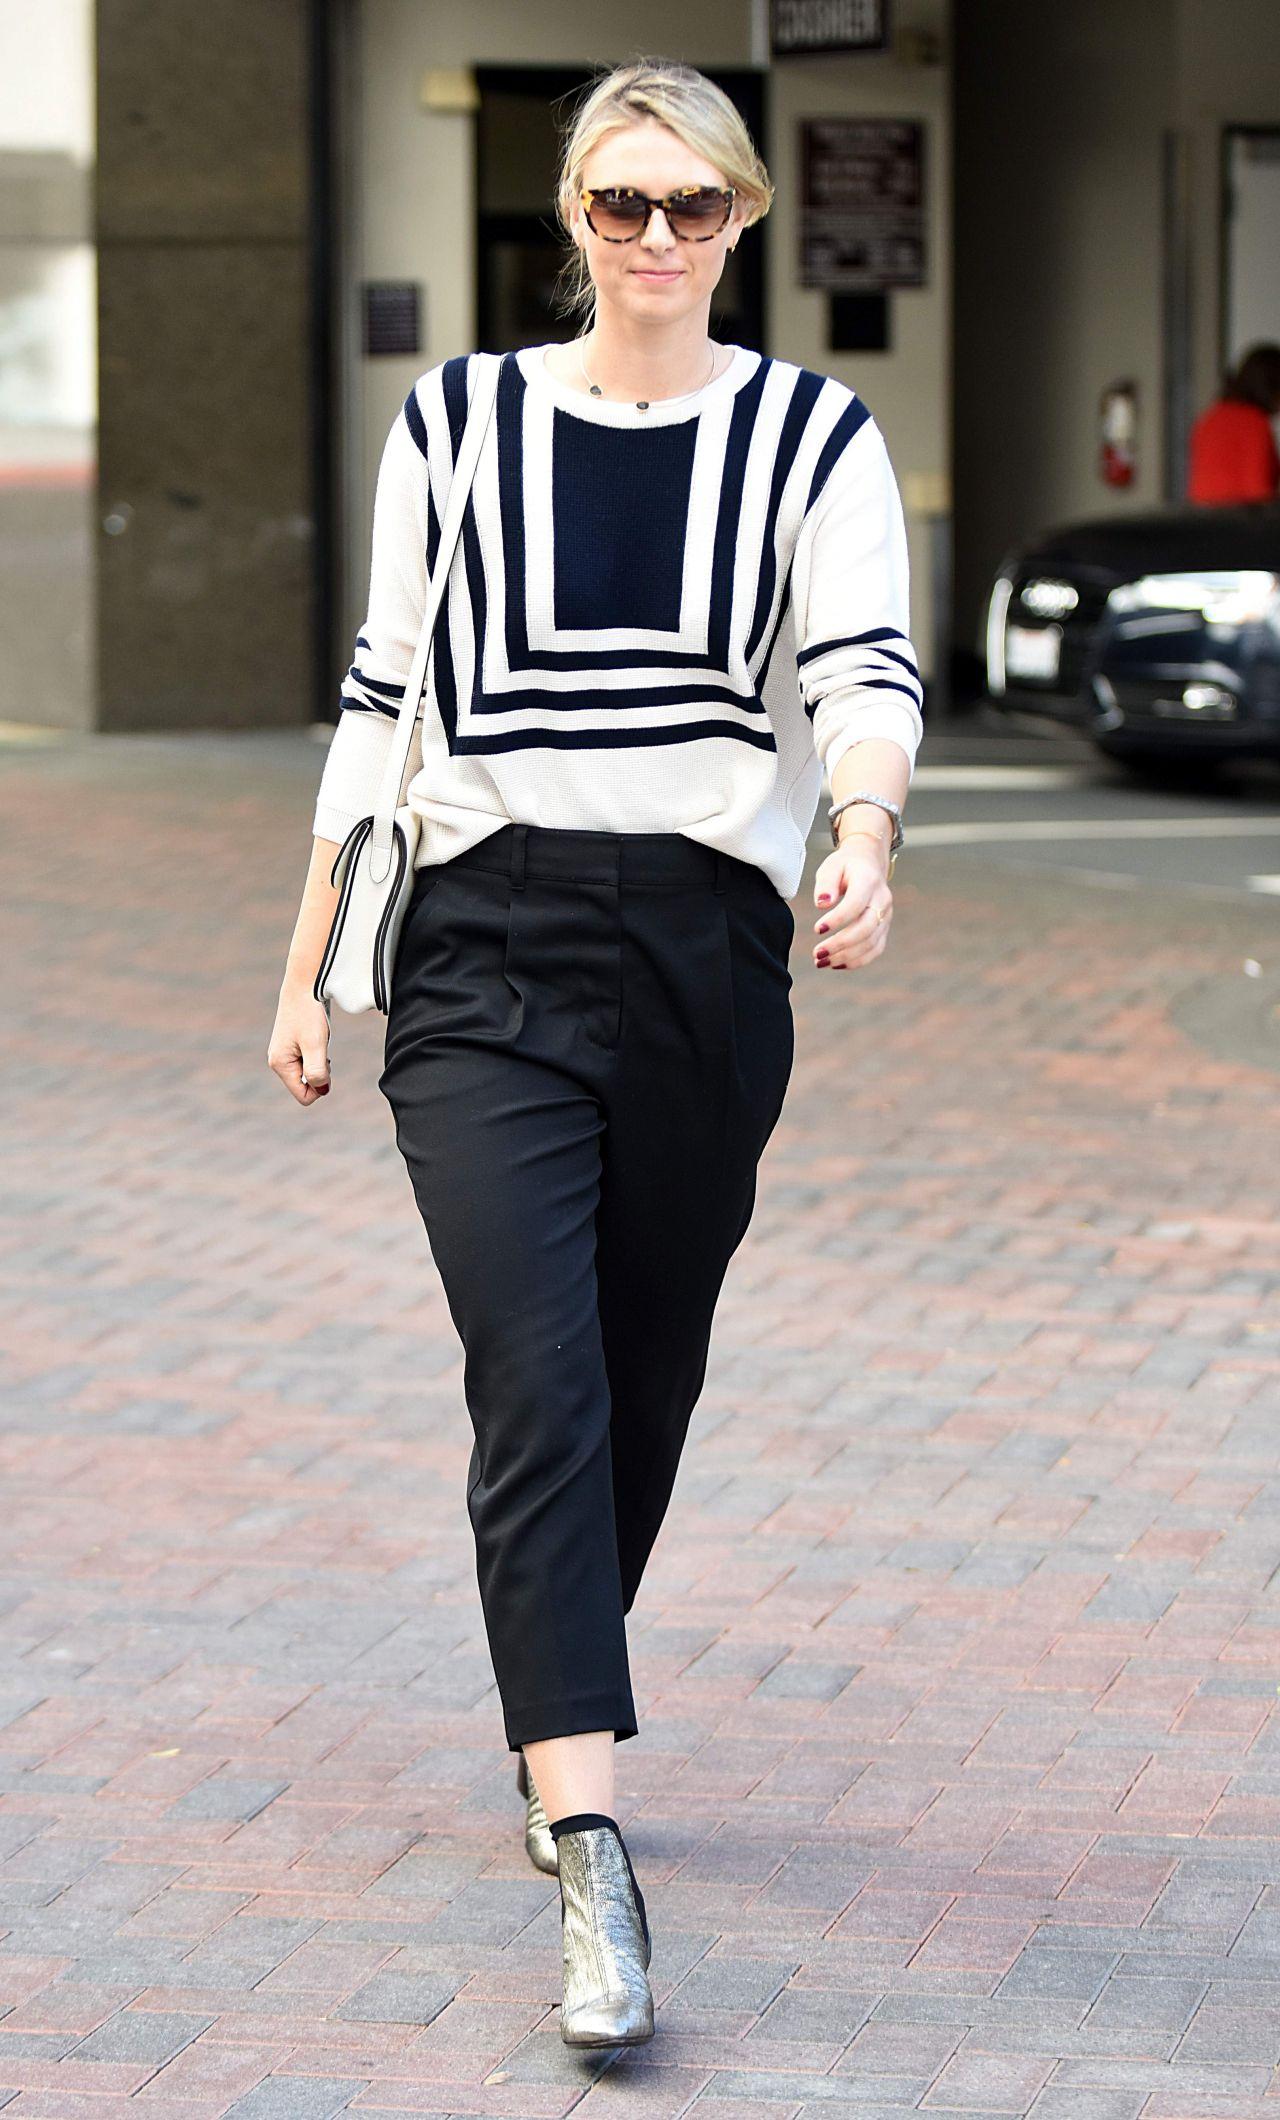 Maria Sharapova Fashion And Style Shopping In Beverly